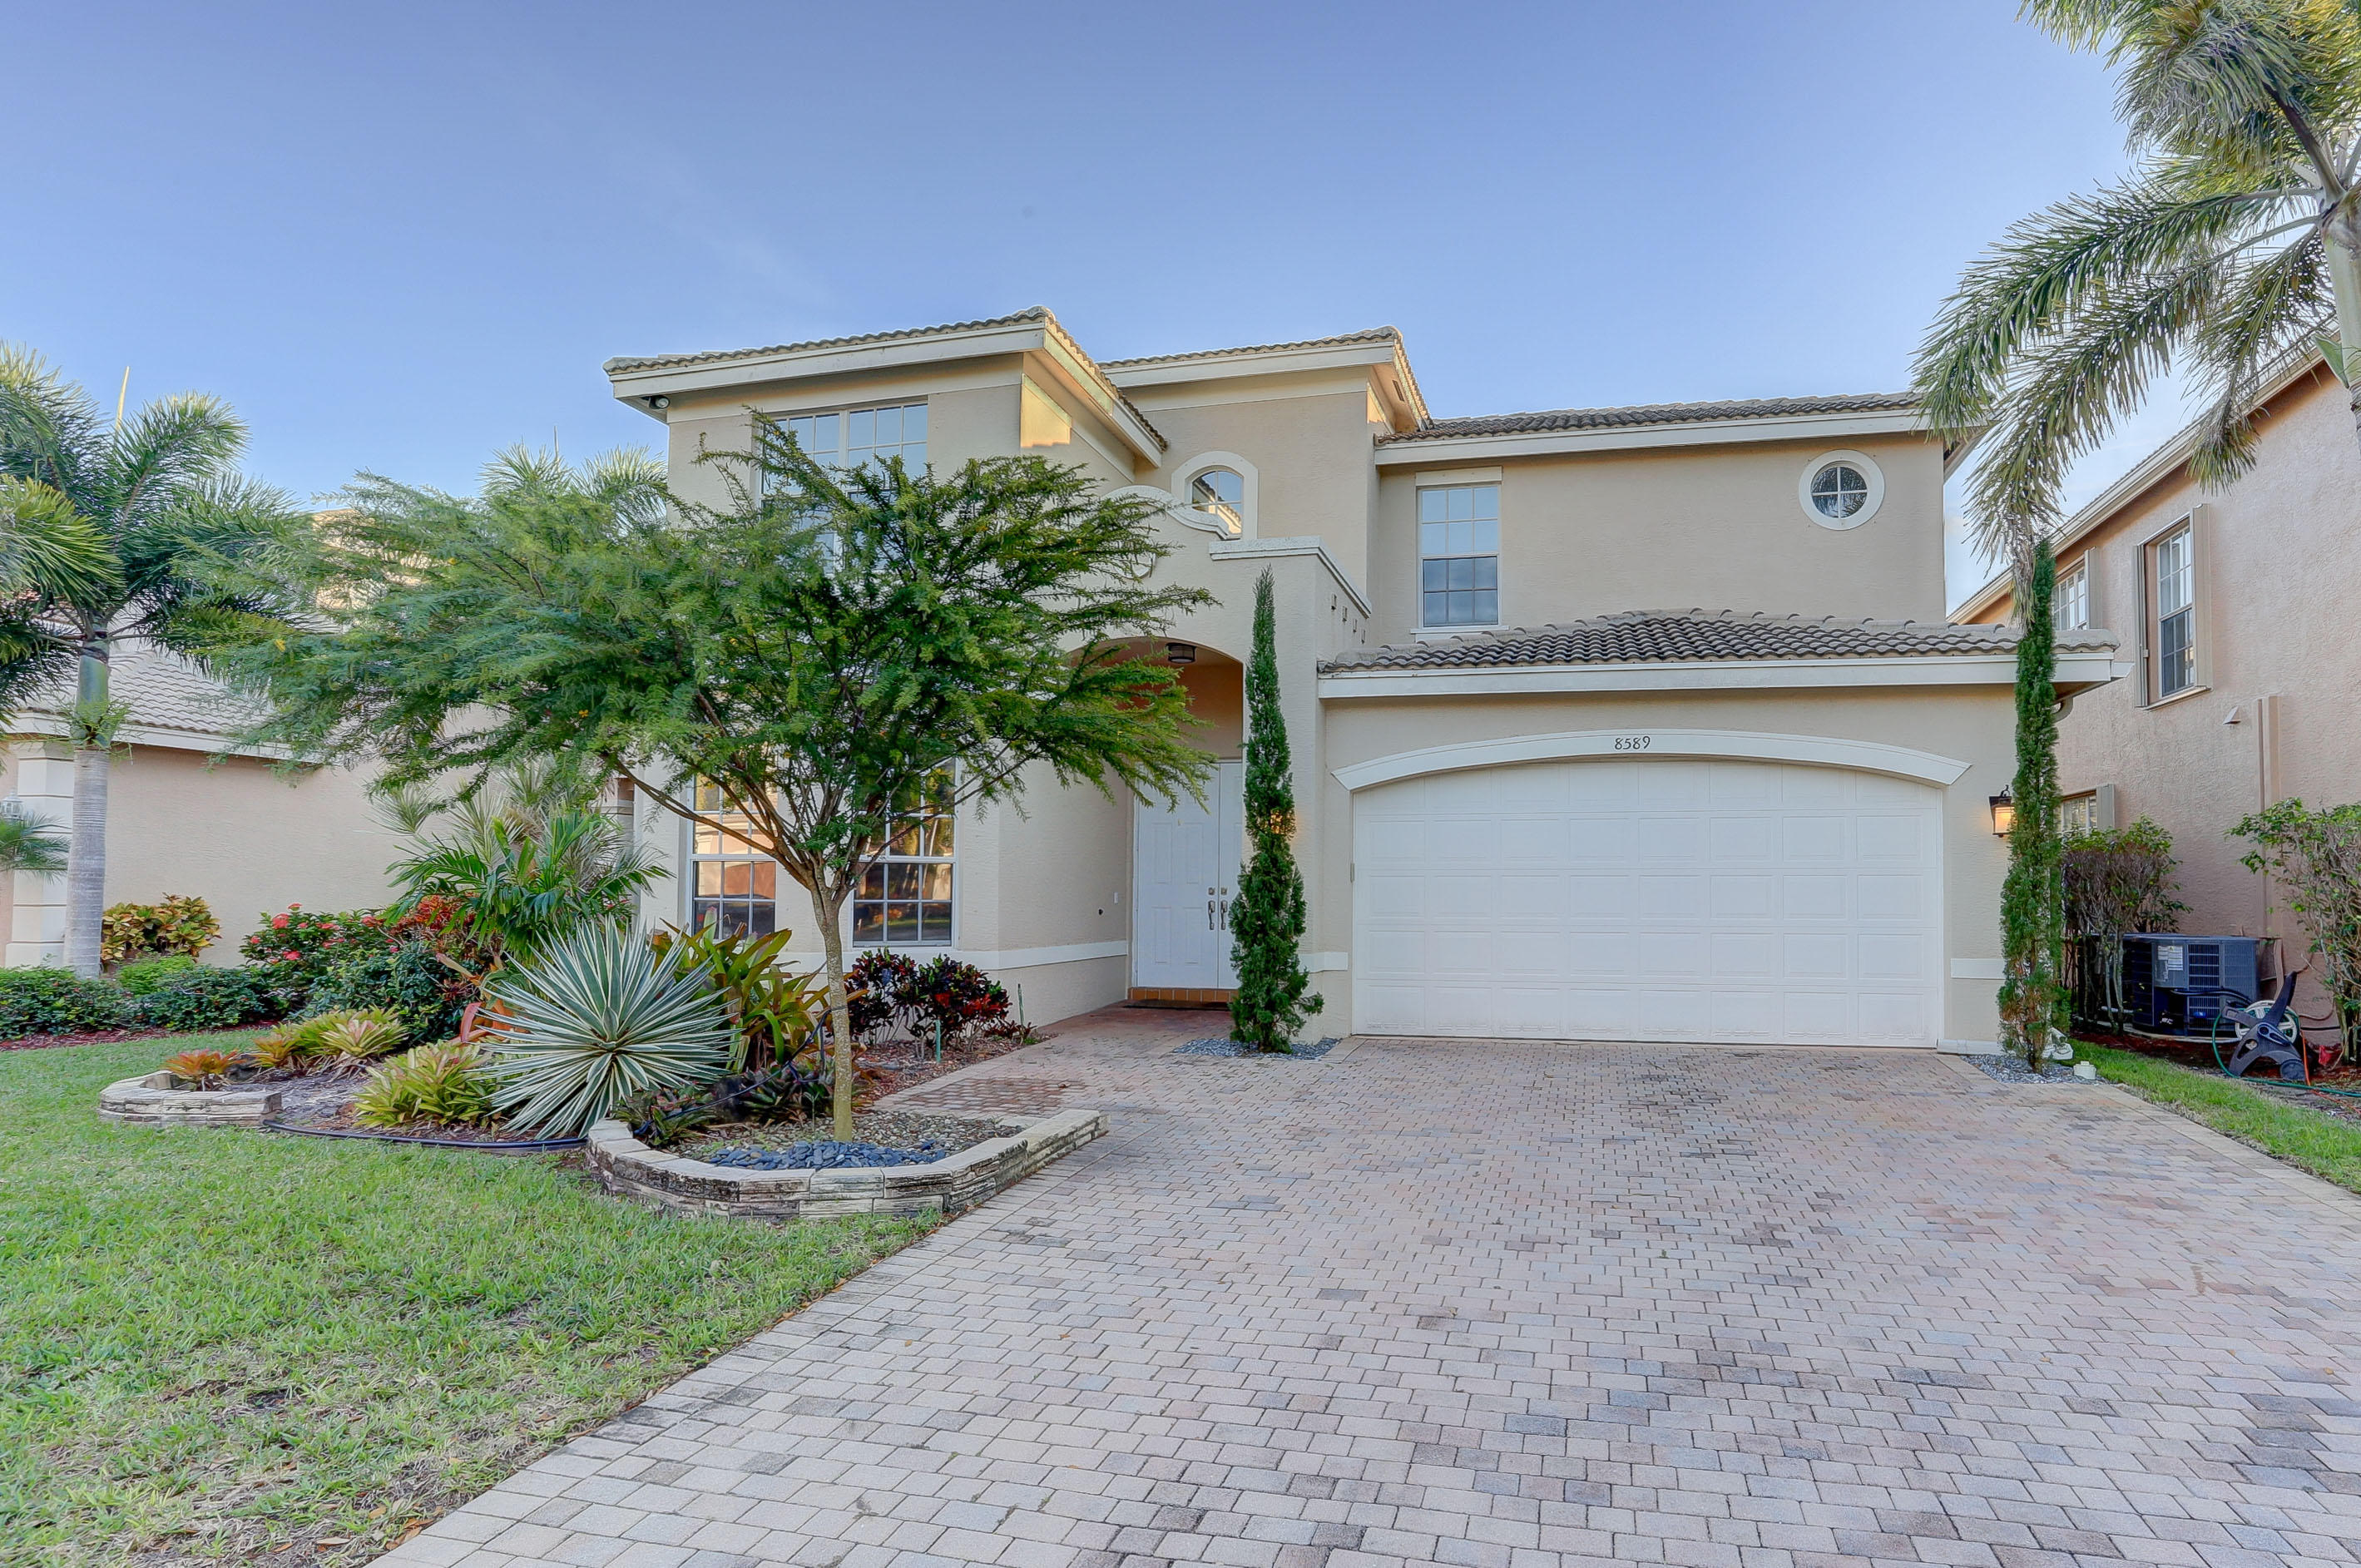 8589 Breezy Hill Drive Boynton Beach, FL 33437